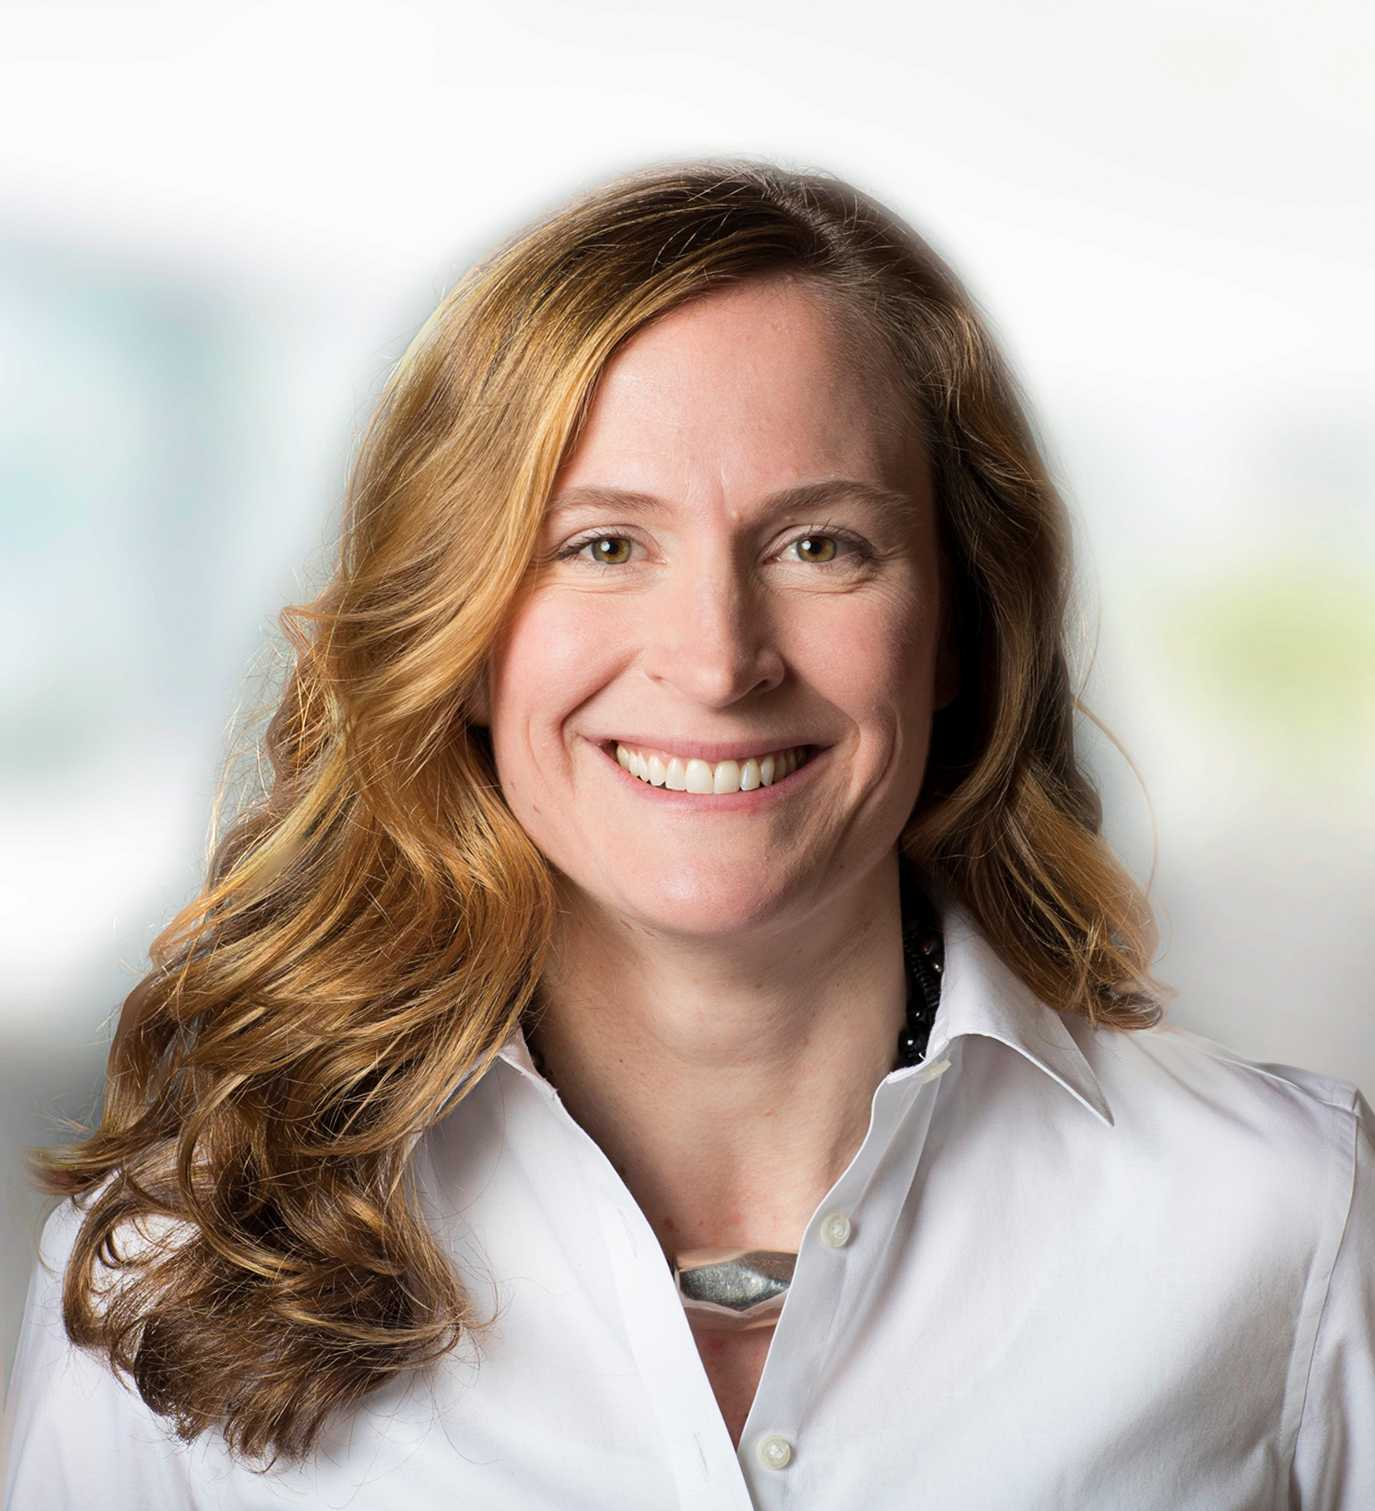 Accruent - Biography - Commercial President - Melissa Hammerle